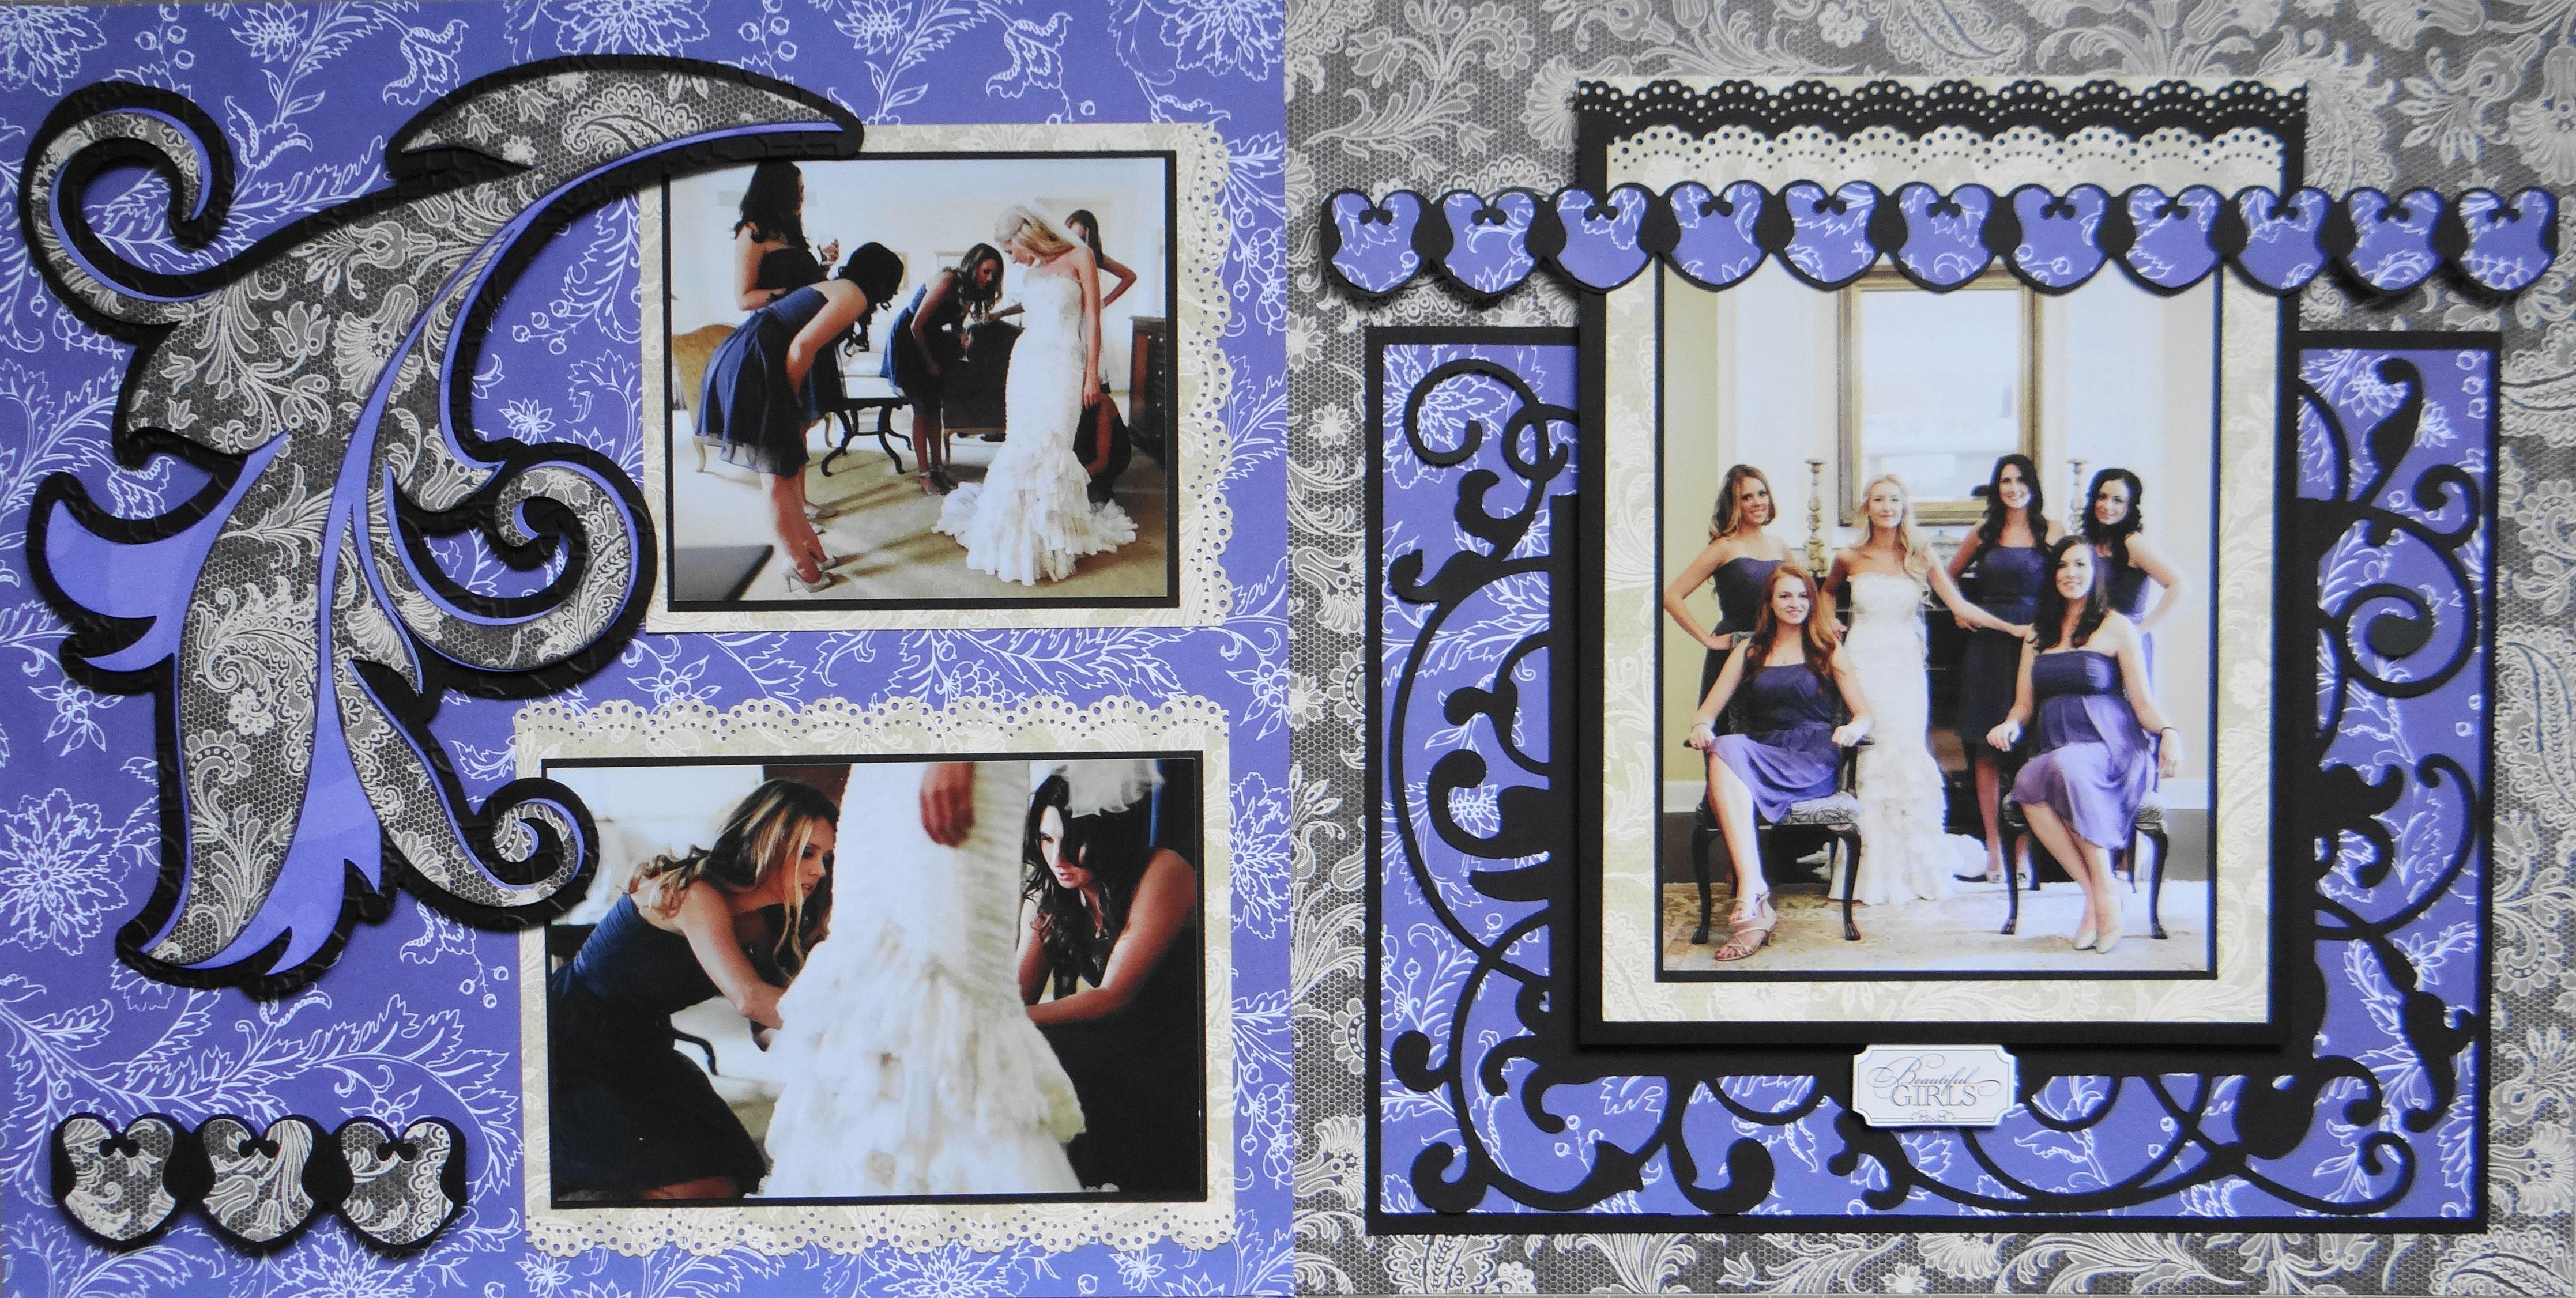 Wedding scrapbook ideas using cricut - Wedding Scrapbook Page The Bride Bridesmaids 2 Page Wedding Layout With A Feather